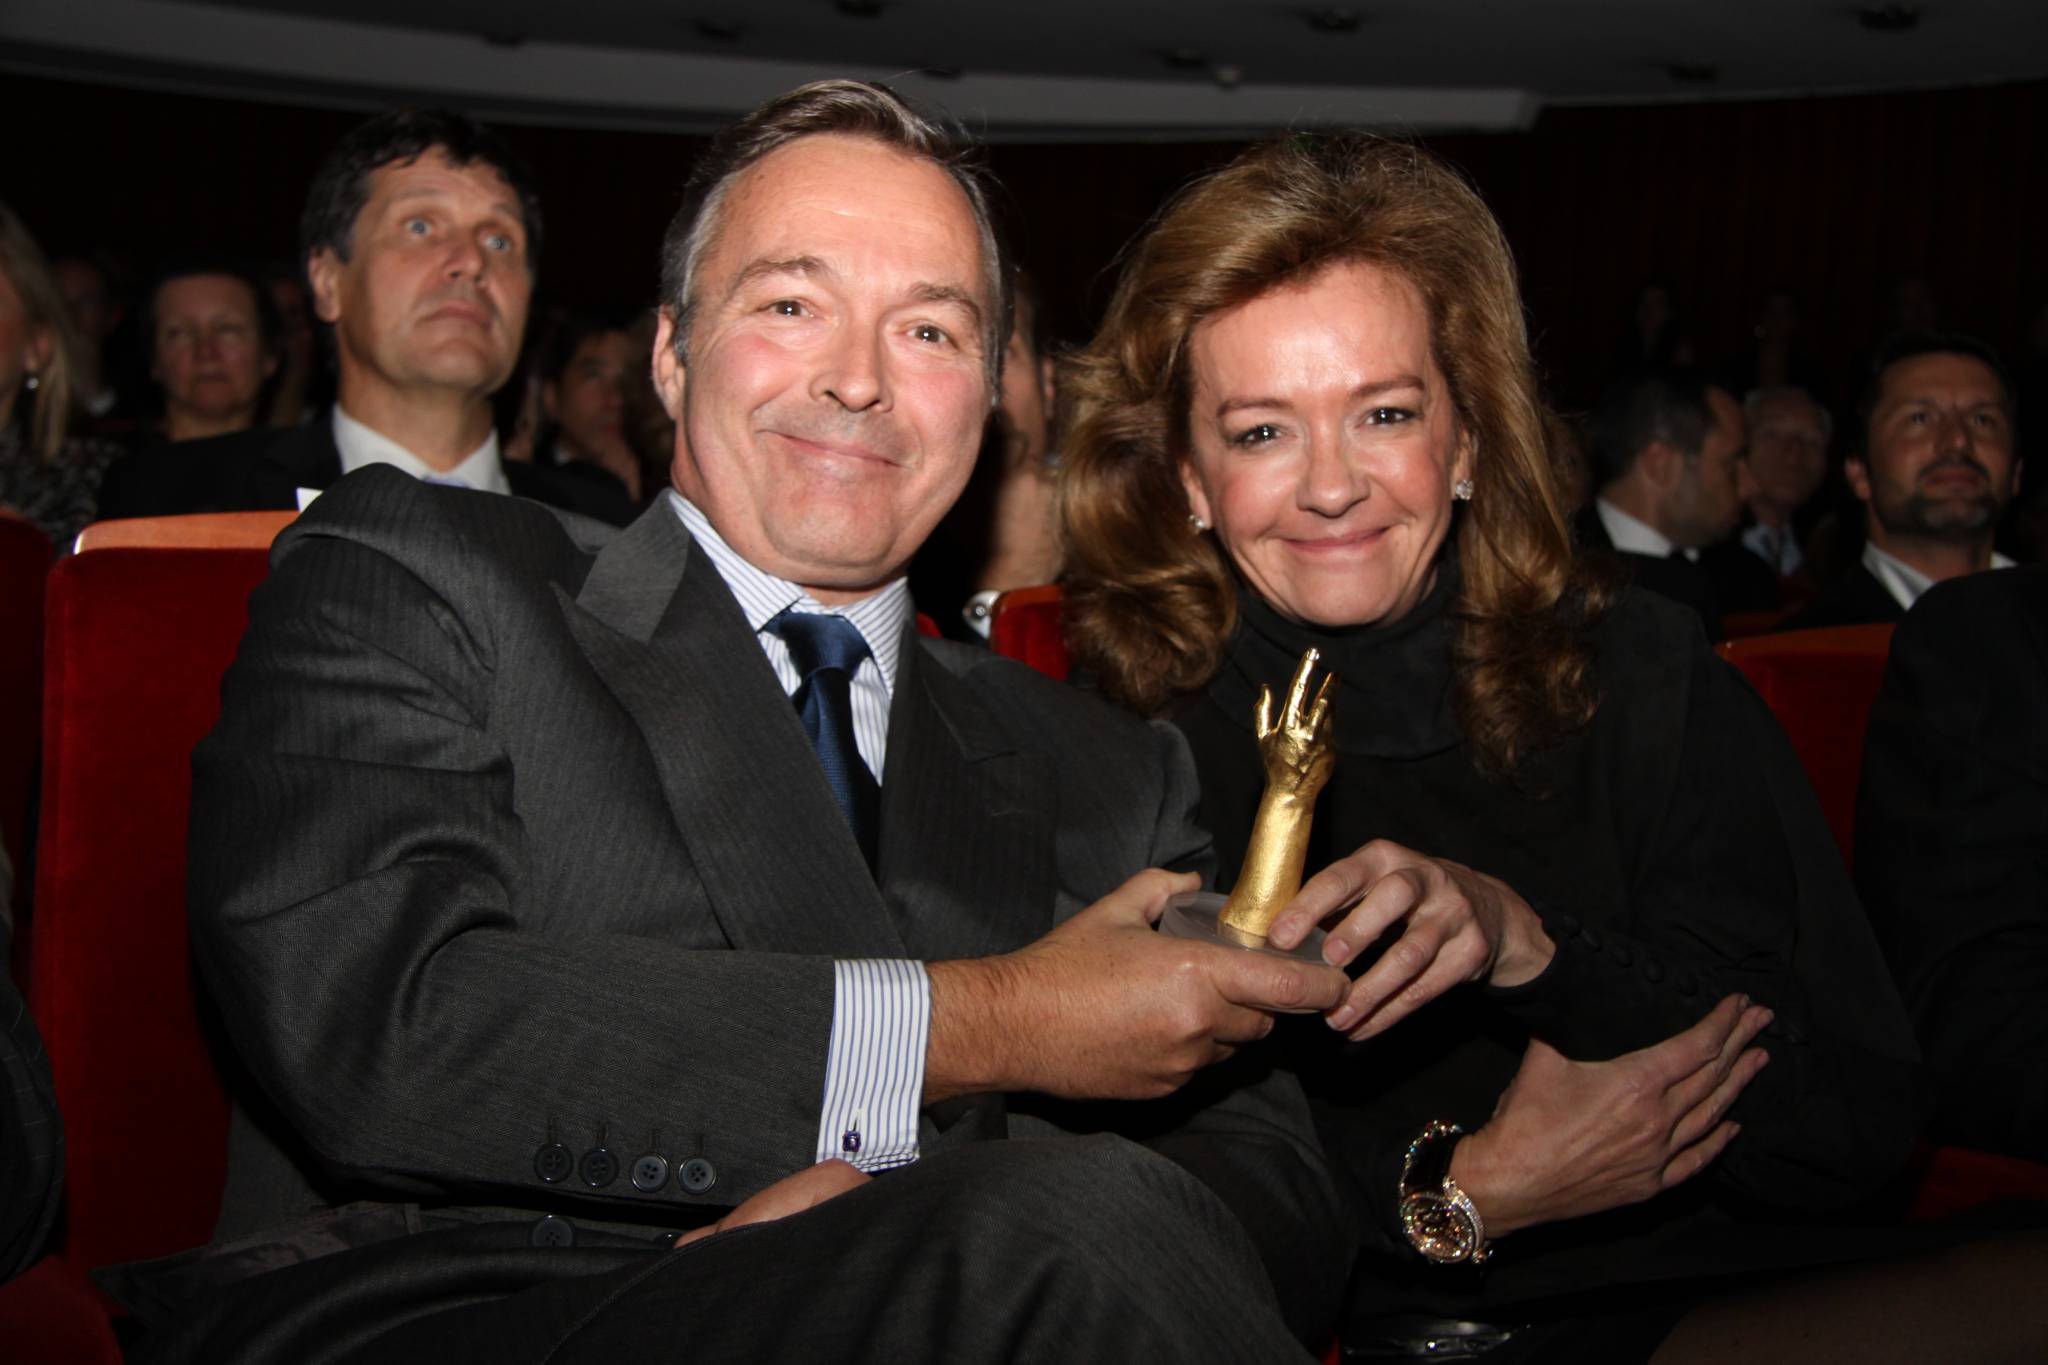 Karl-Friedrich Scheufele et Caroline Scheufele, co-présidents de Chopard, cérémonie 2010